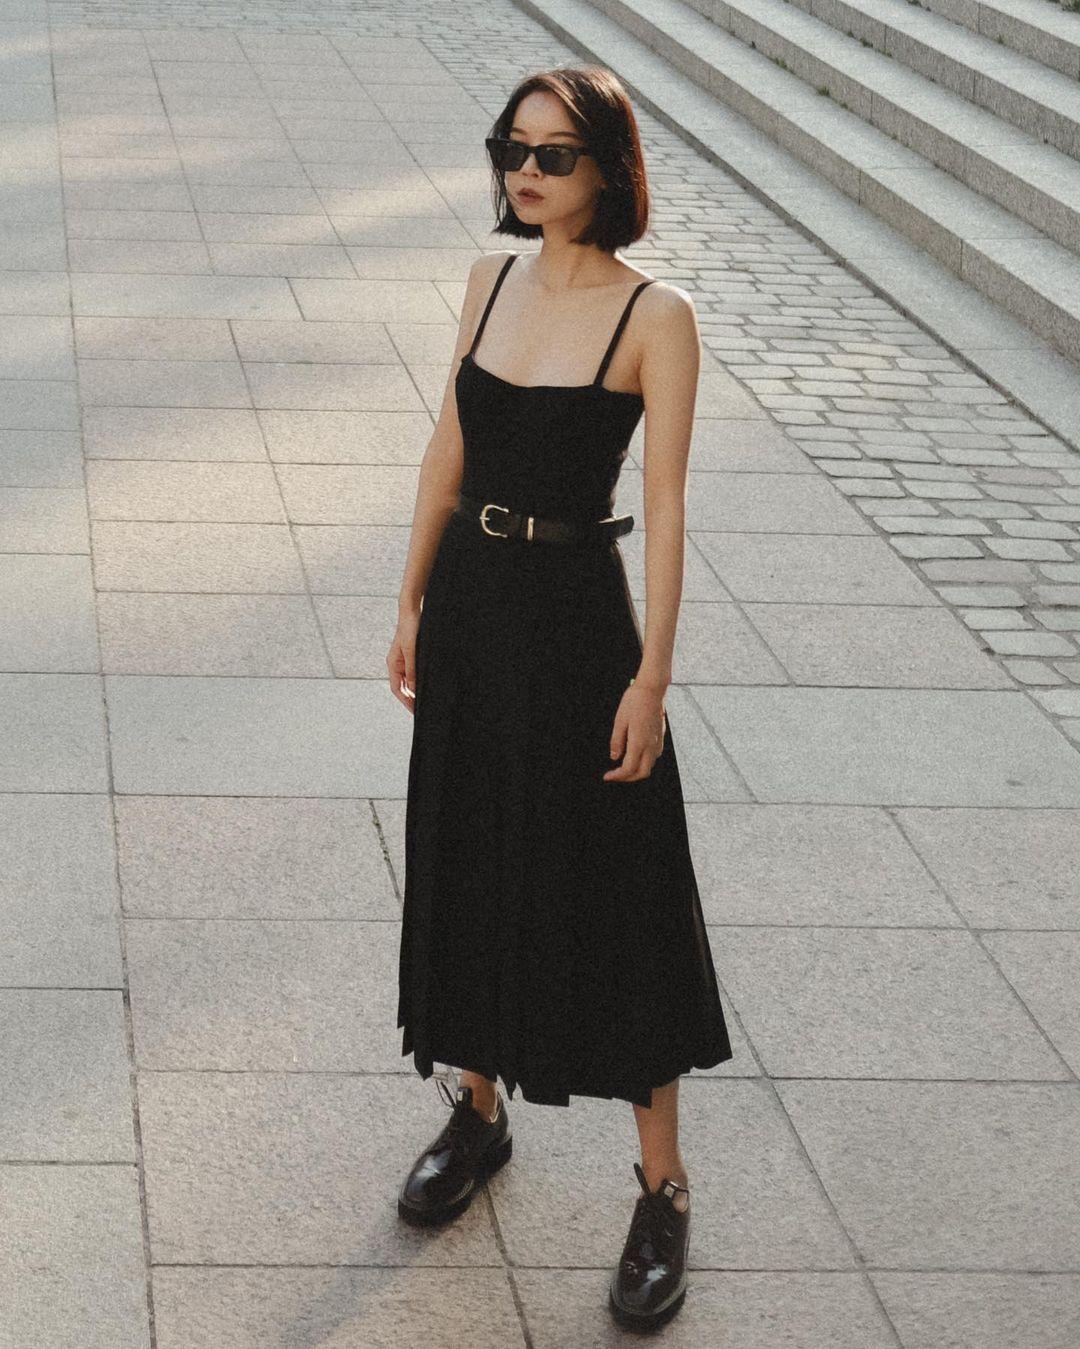 váy đen dạo phố dress code street style